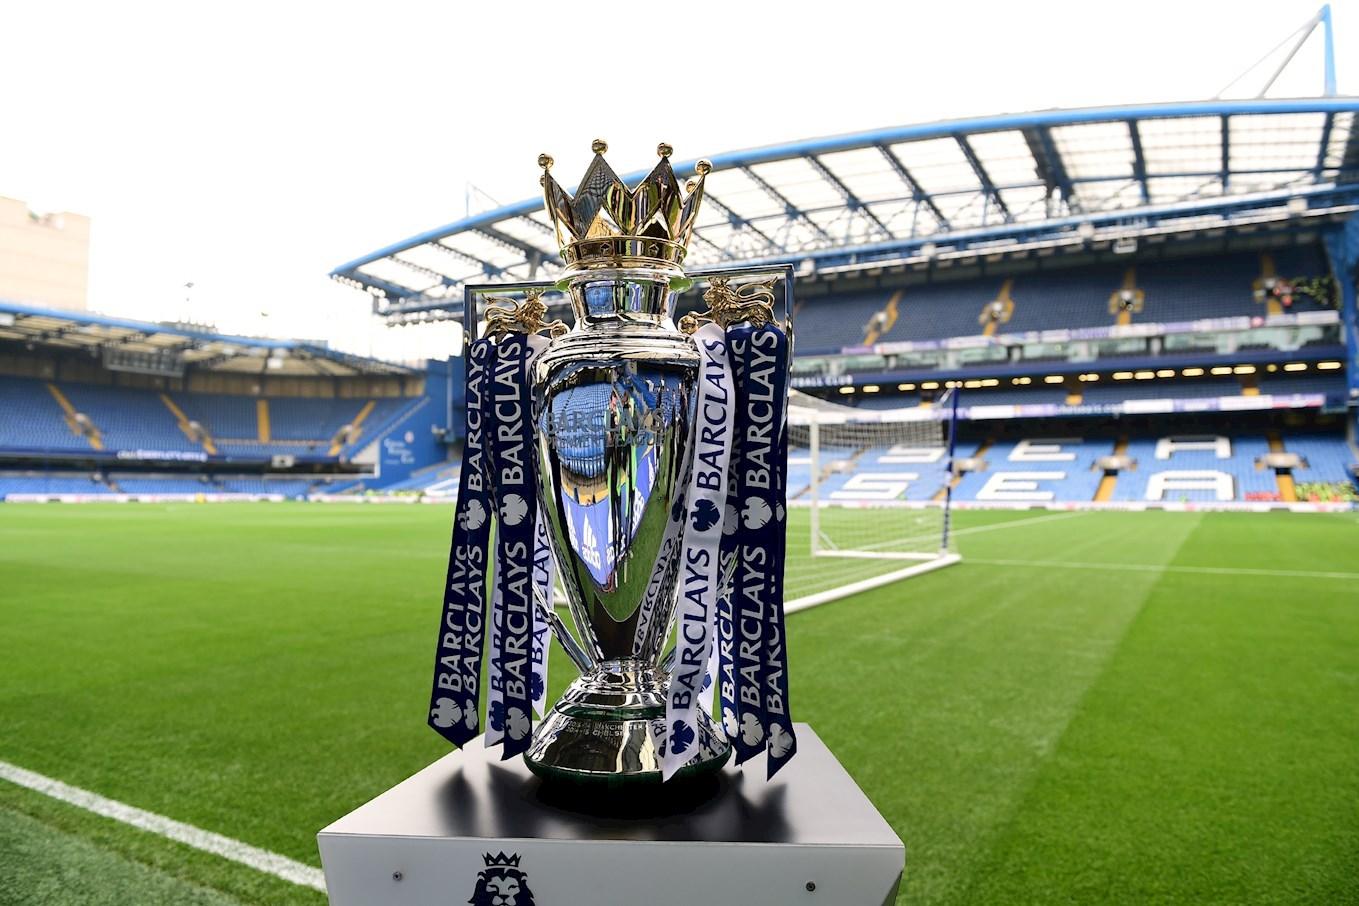 Premier League Trophy To Visit SN1 - News - Swindon Town